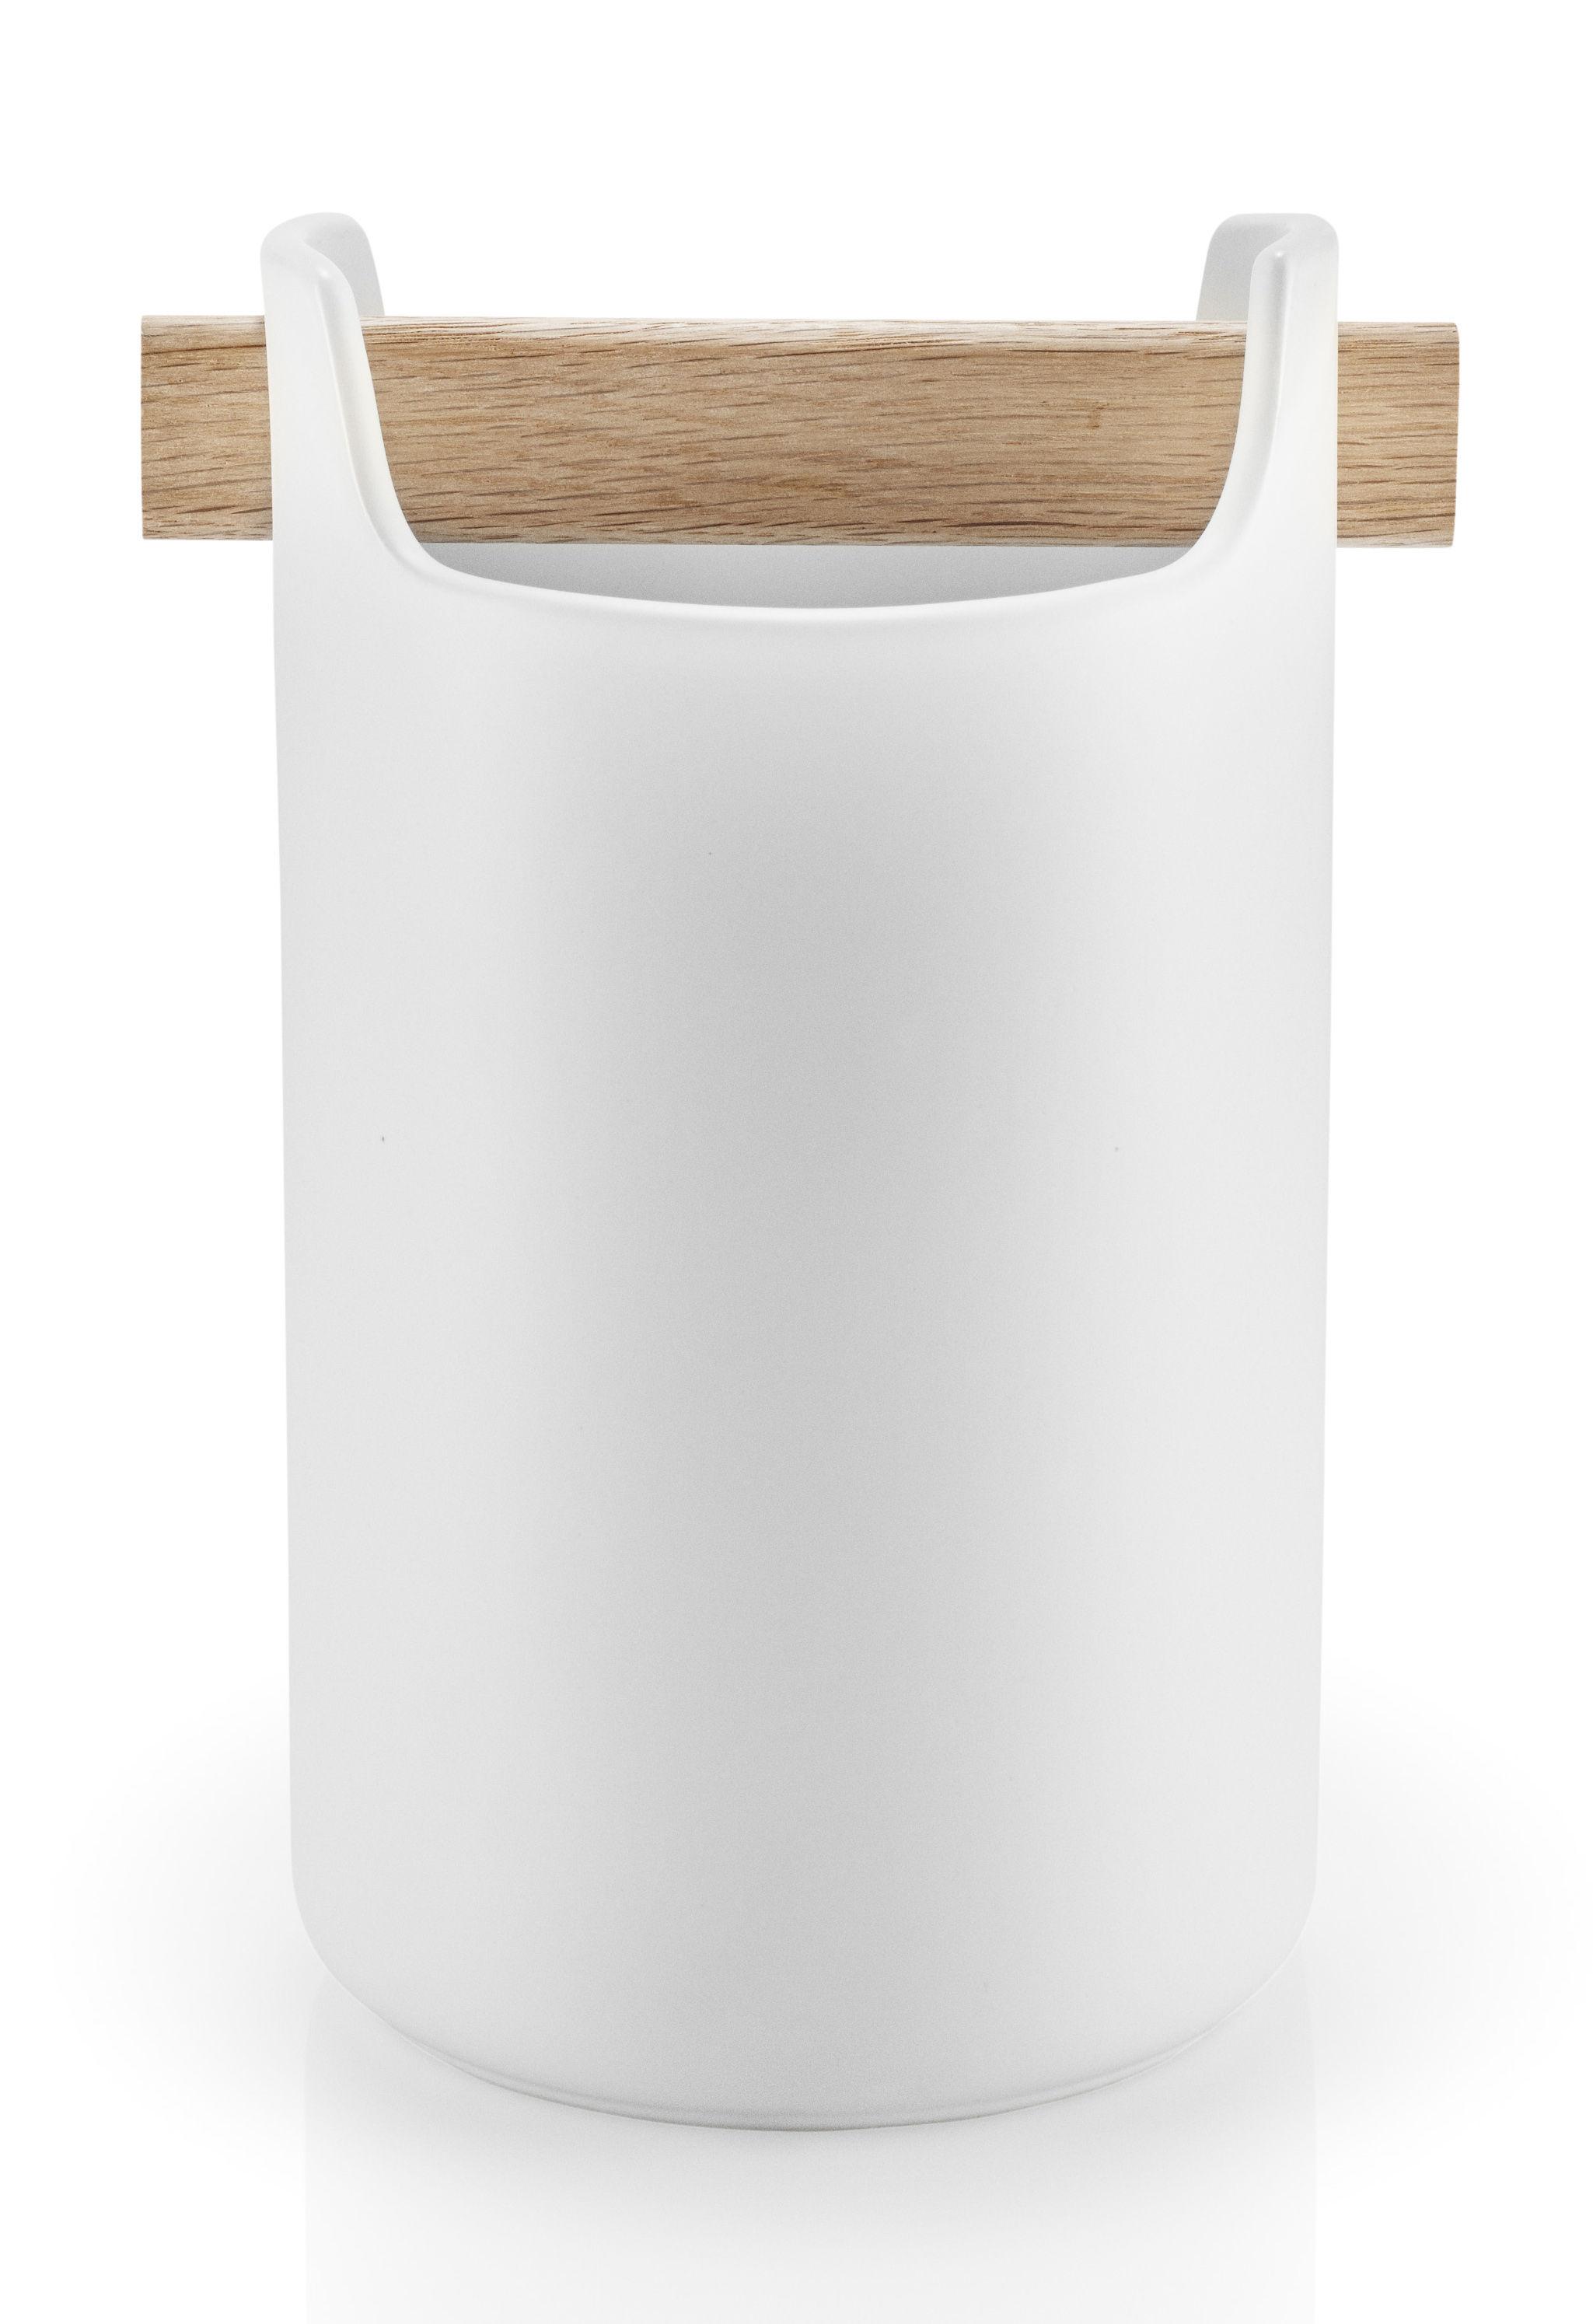 topf 18 cm x h 20 cm keramik eiche wei eiche by eva solo made in design. Black Bedroom Furniture Sets. Home Design Ideas